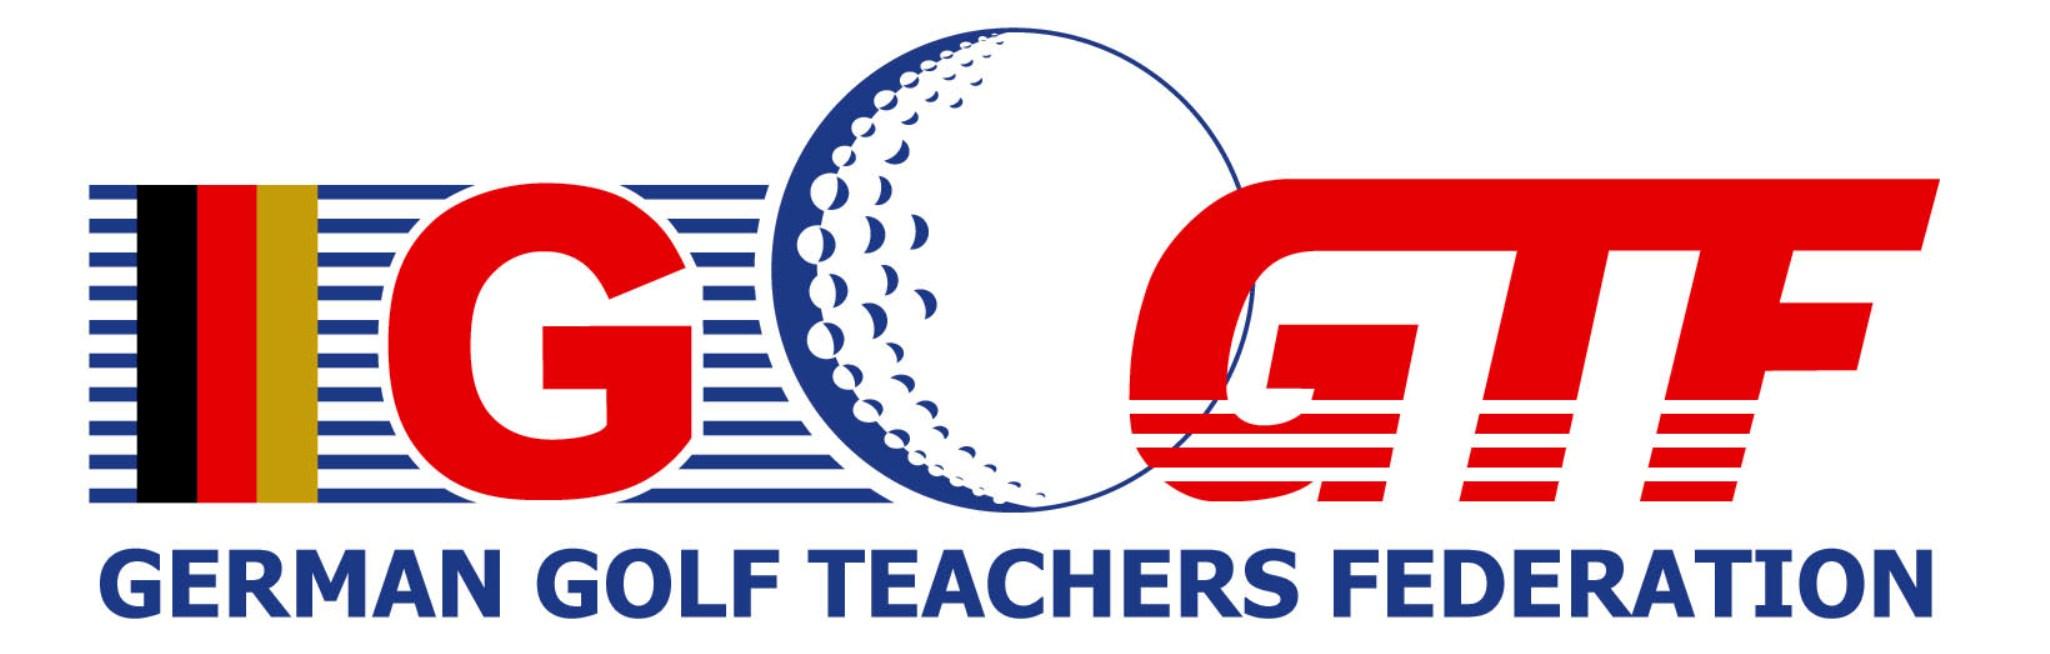 https://golfrange-ffm.de/storage/app/media/Trainer/logos/GGTF%20german%20mit%20Link%2020.5X6.5.jpg